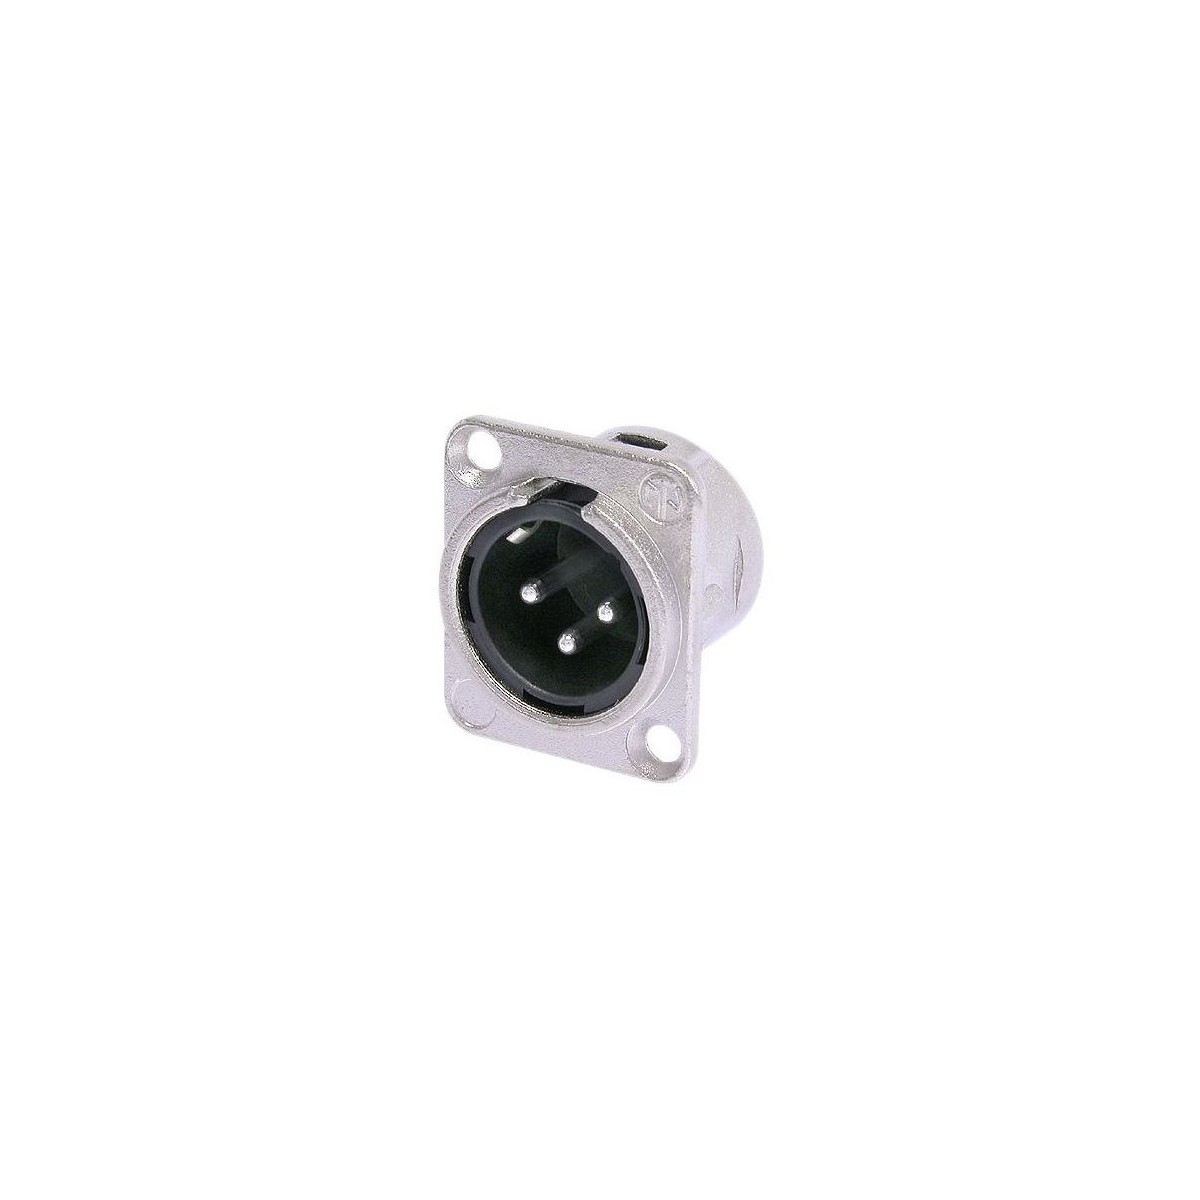 5 él Pack tóricas 30 x 2,5 mm-innendurchm x espesor//oringe//o anillos